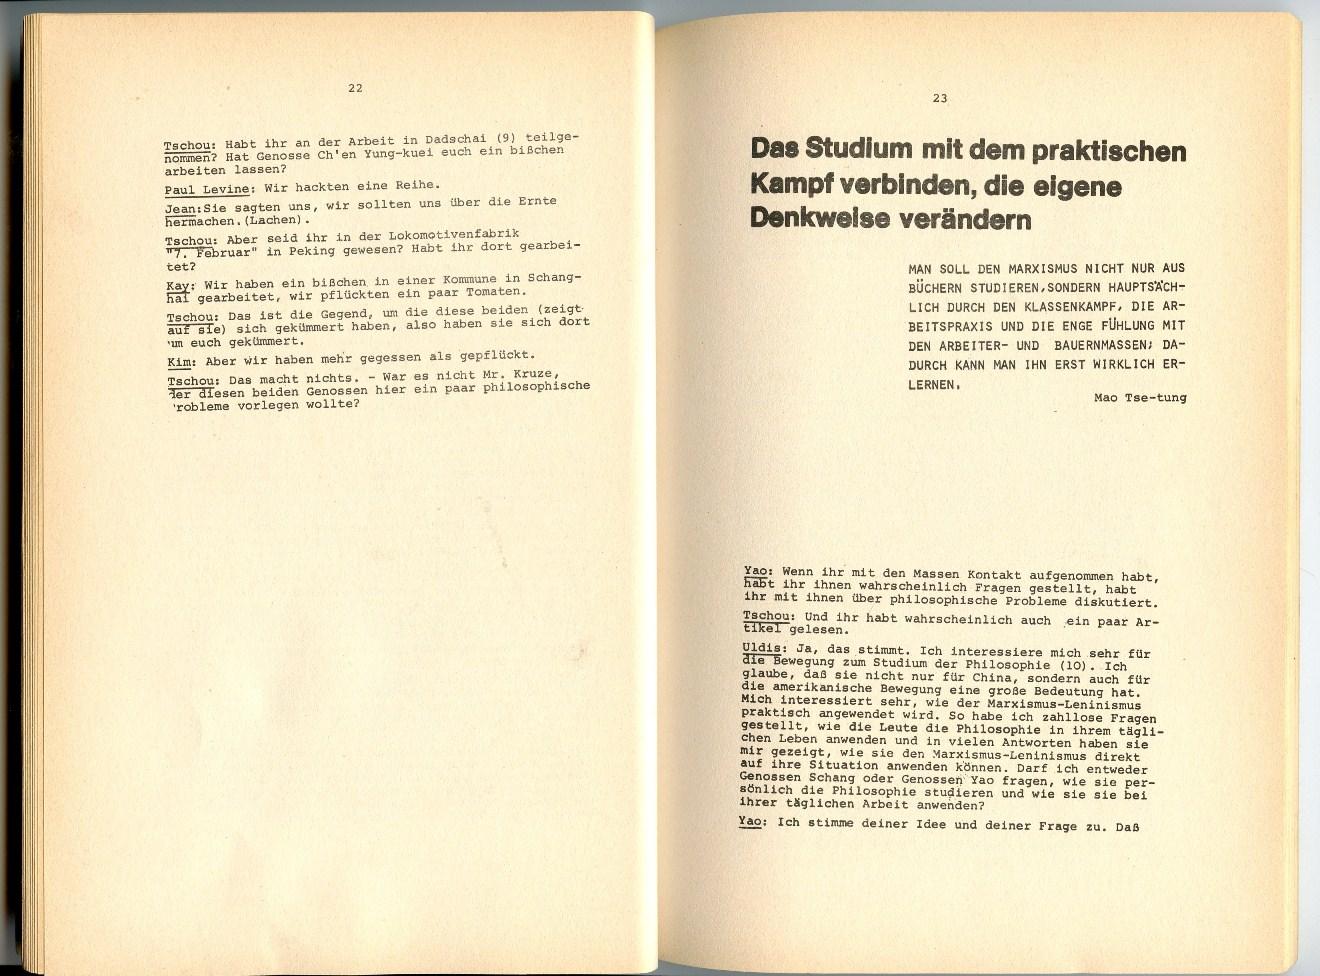 ZB_VRChina_Bollwerk_1971_13